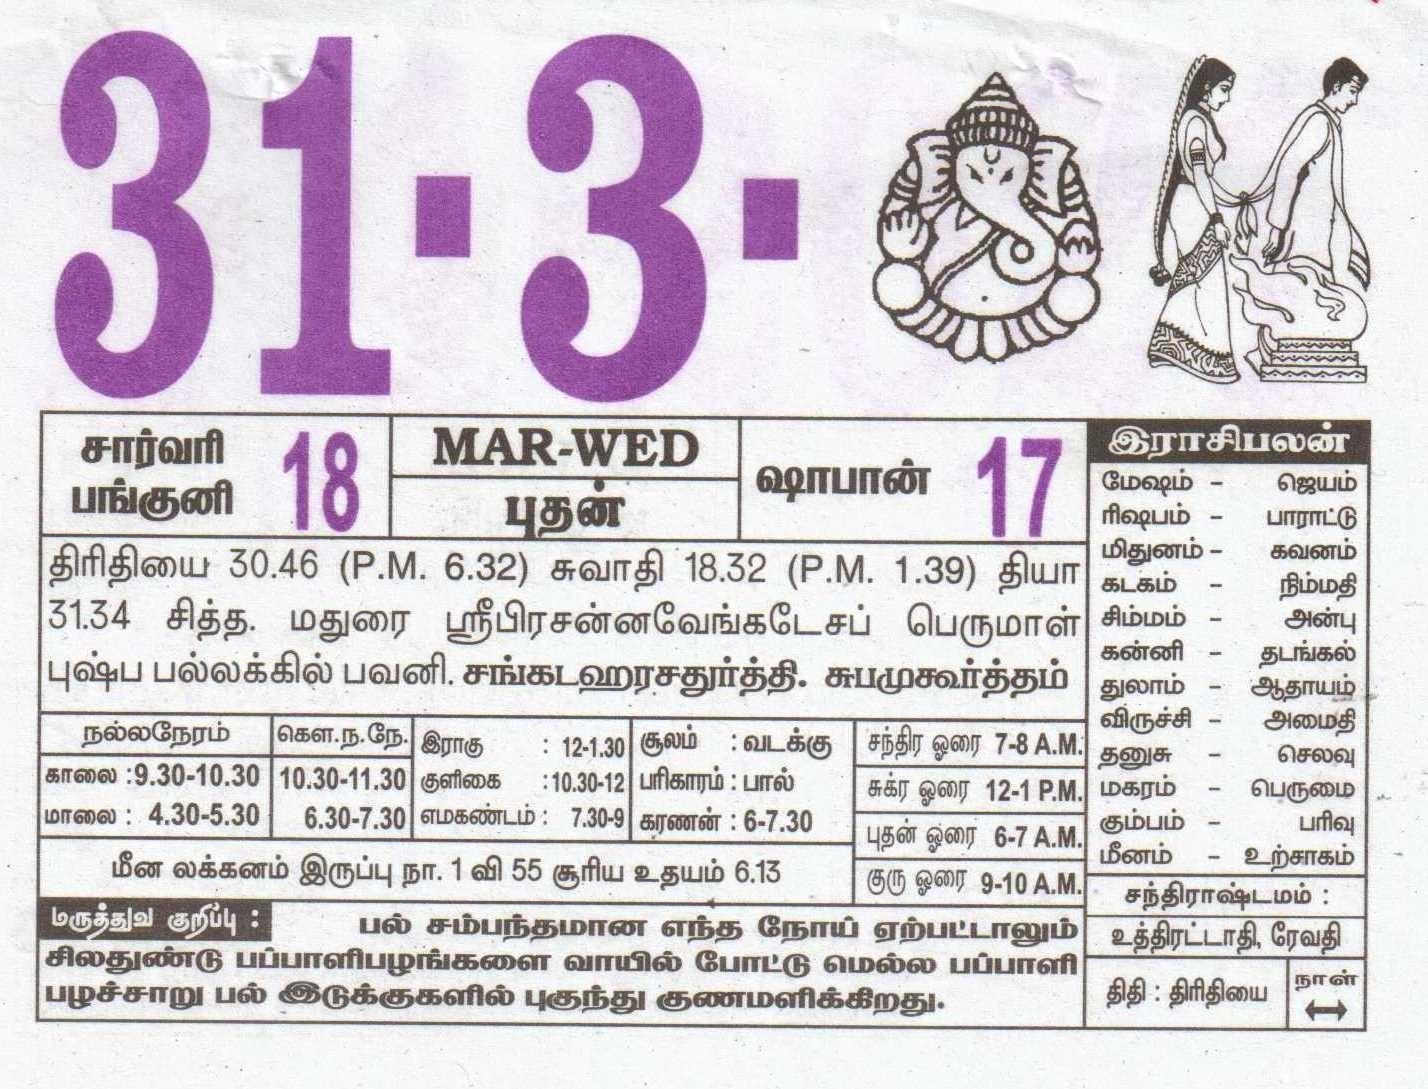 31-03-2021 Daily Calendar | Date 31 , January Daily Tear Off Calendar | Daily Panchangam Rasi Palan Marriage Dates In June 2021 Hindu Calendar